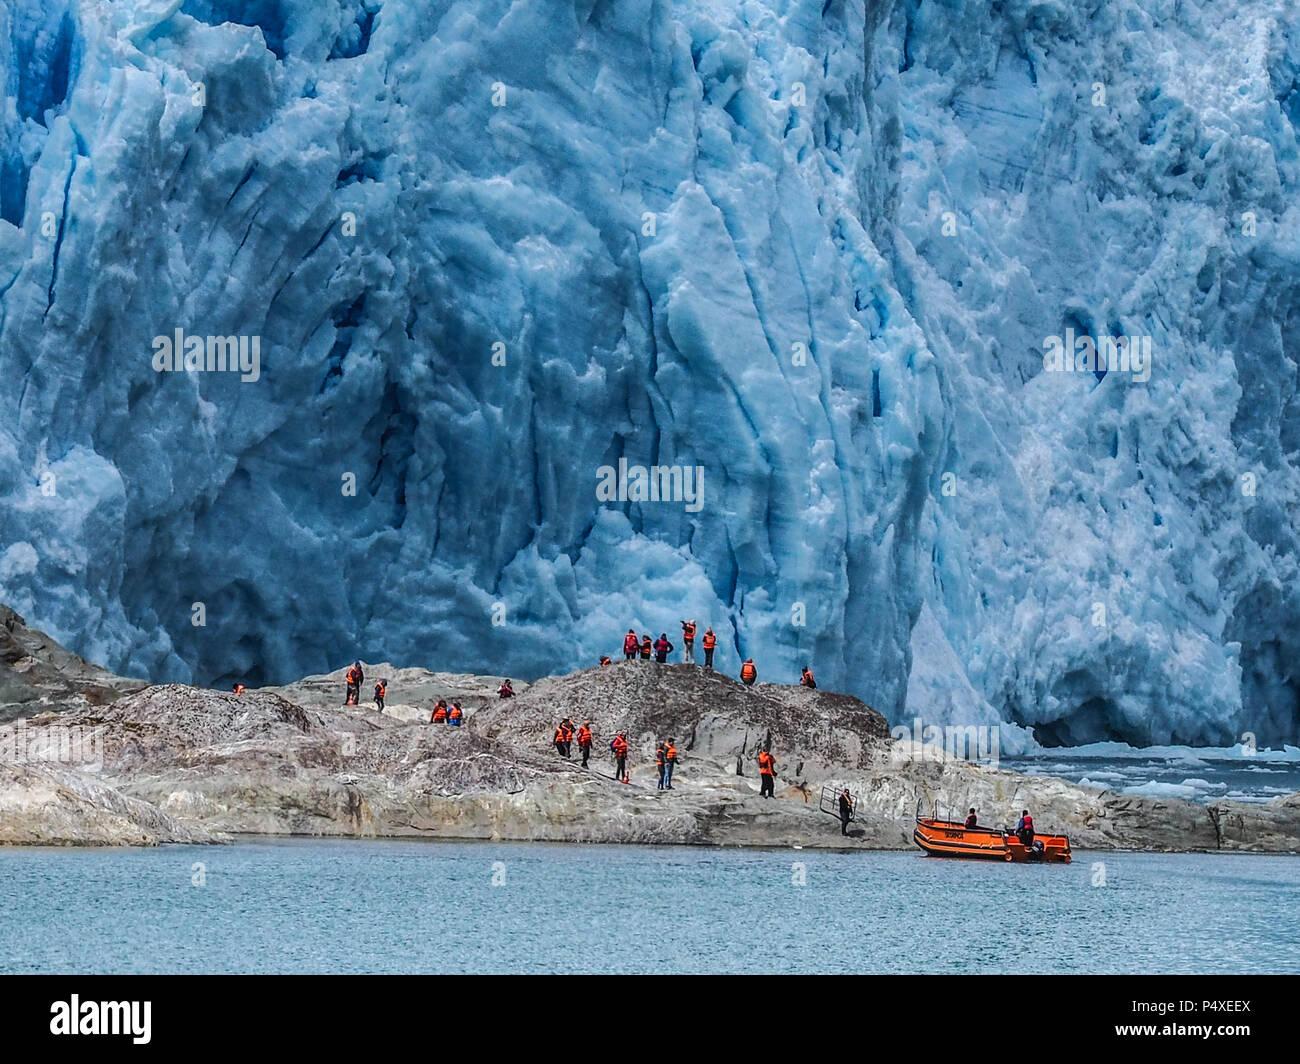 Tourists wearing life jackets explore a glacier in Torres del Paine National Park, Magallanes y de la Antartica, Patagonia, Chile Stock Photo